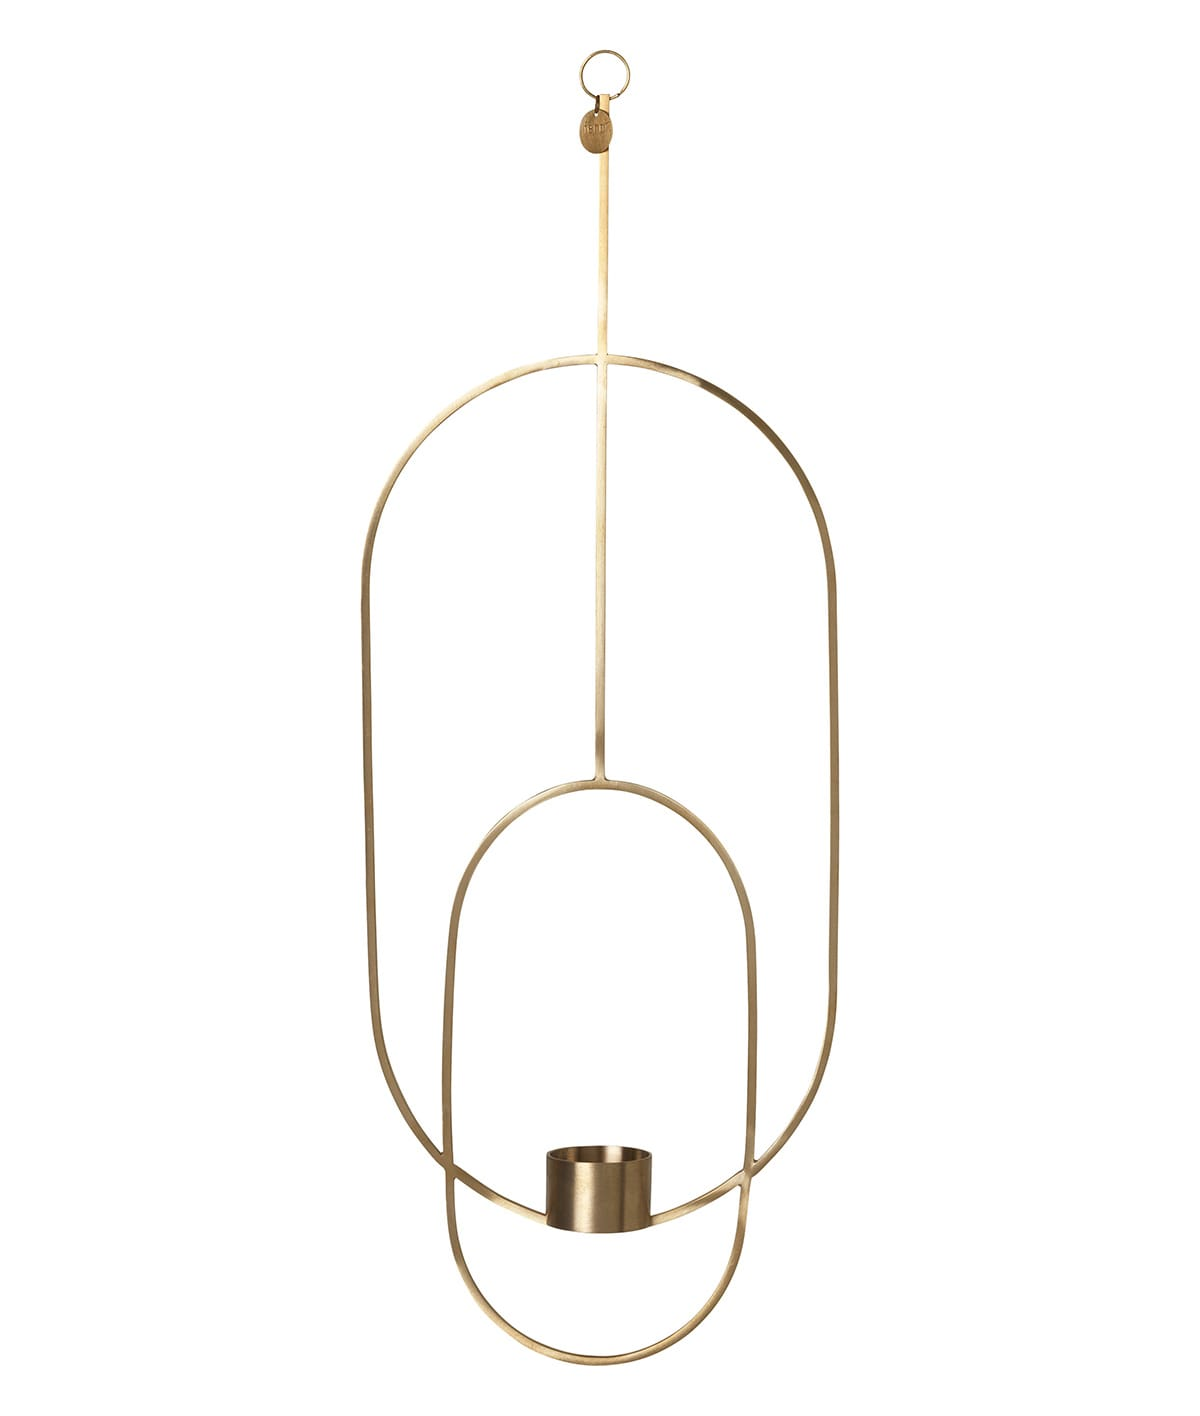 Ferm Living  Oval Hanging Deco Tealight Holder